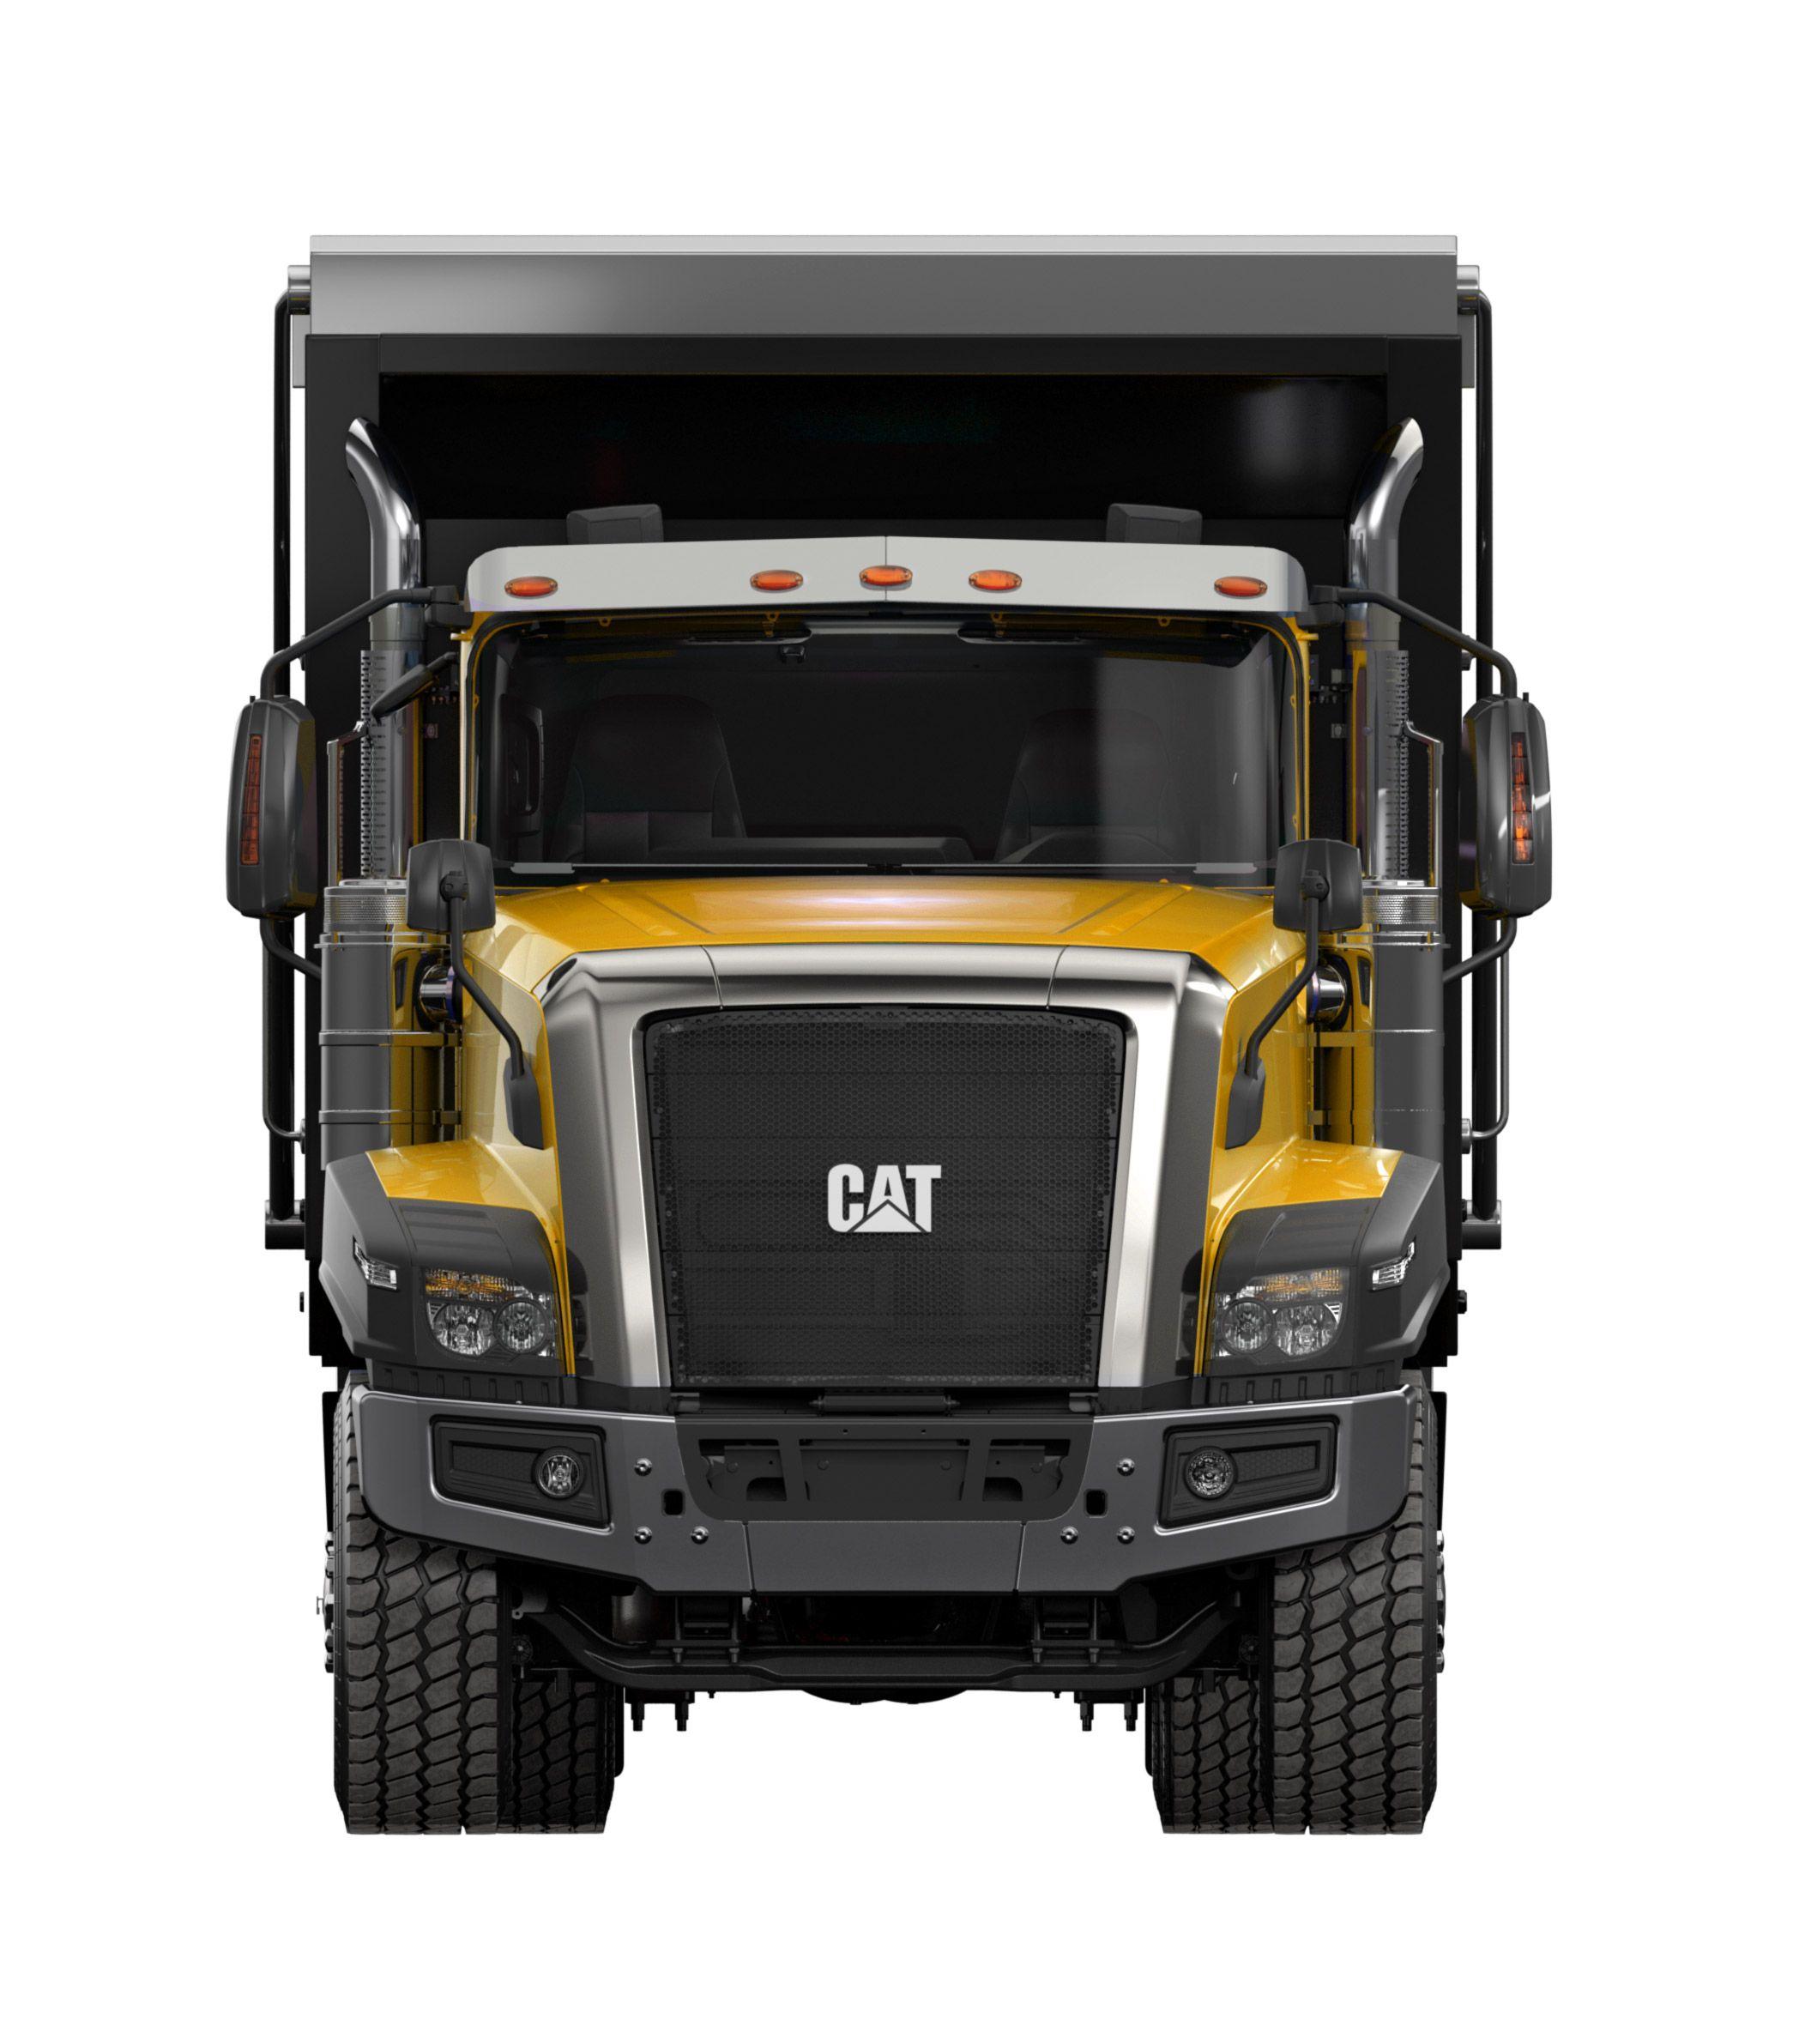 New Cat On-highway Trucks For Sale